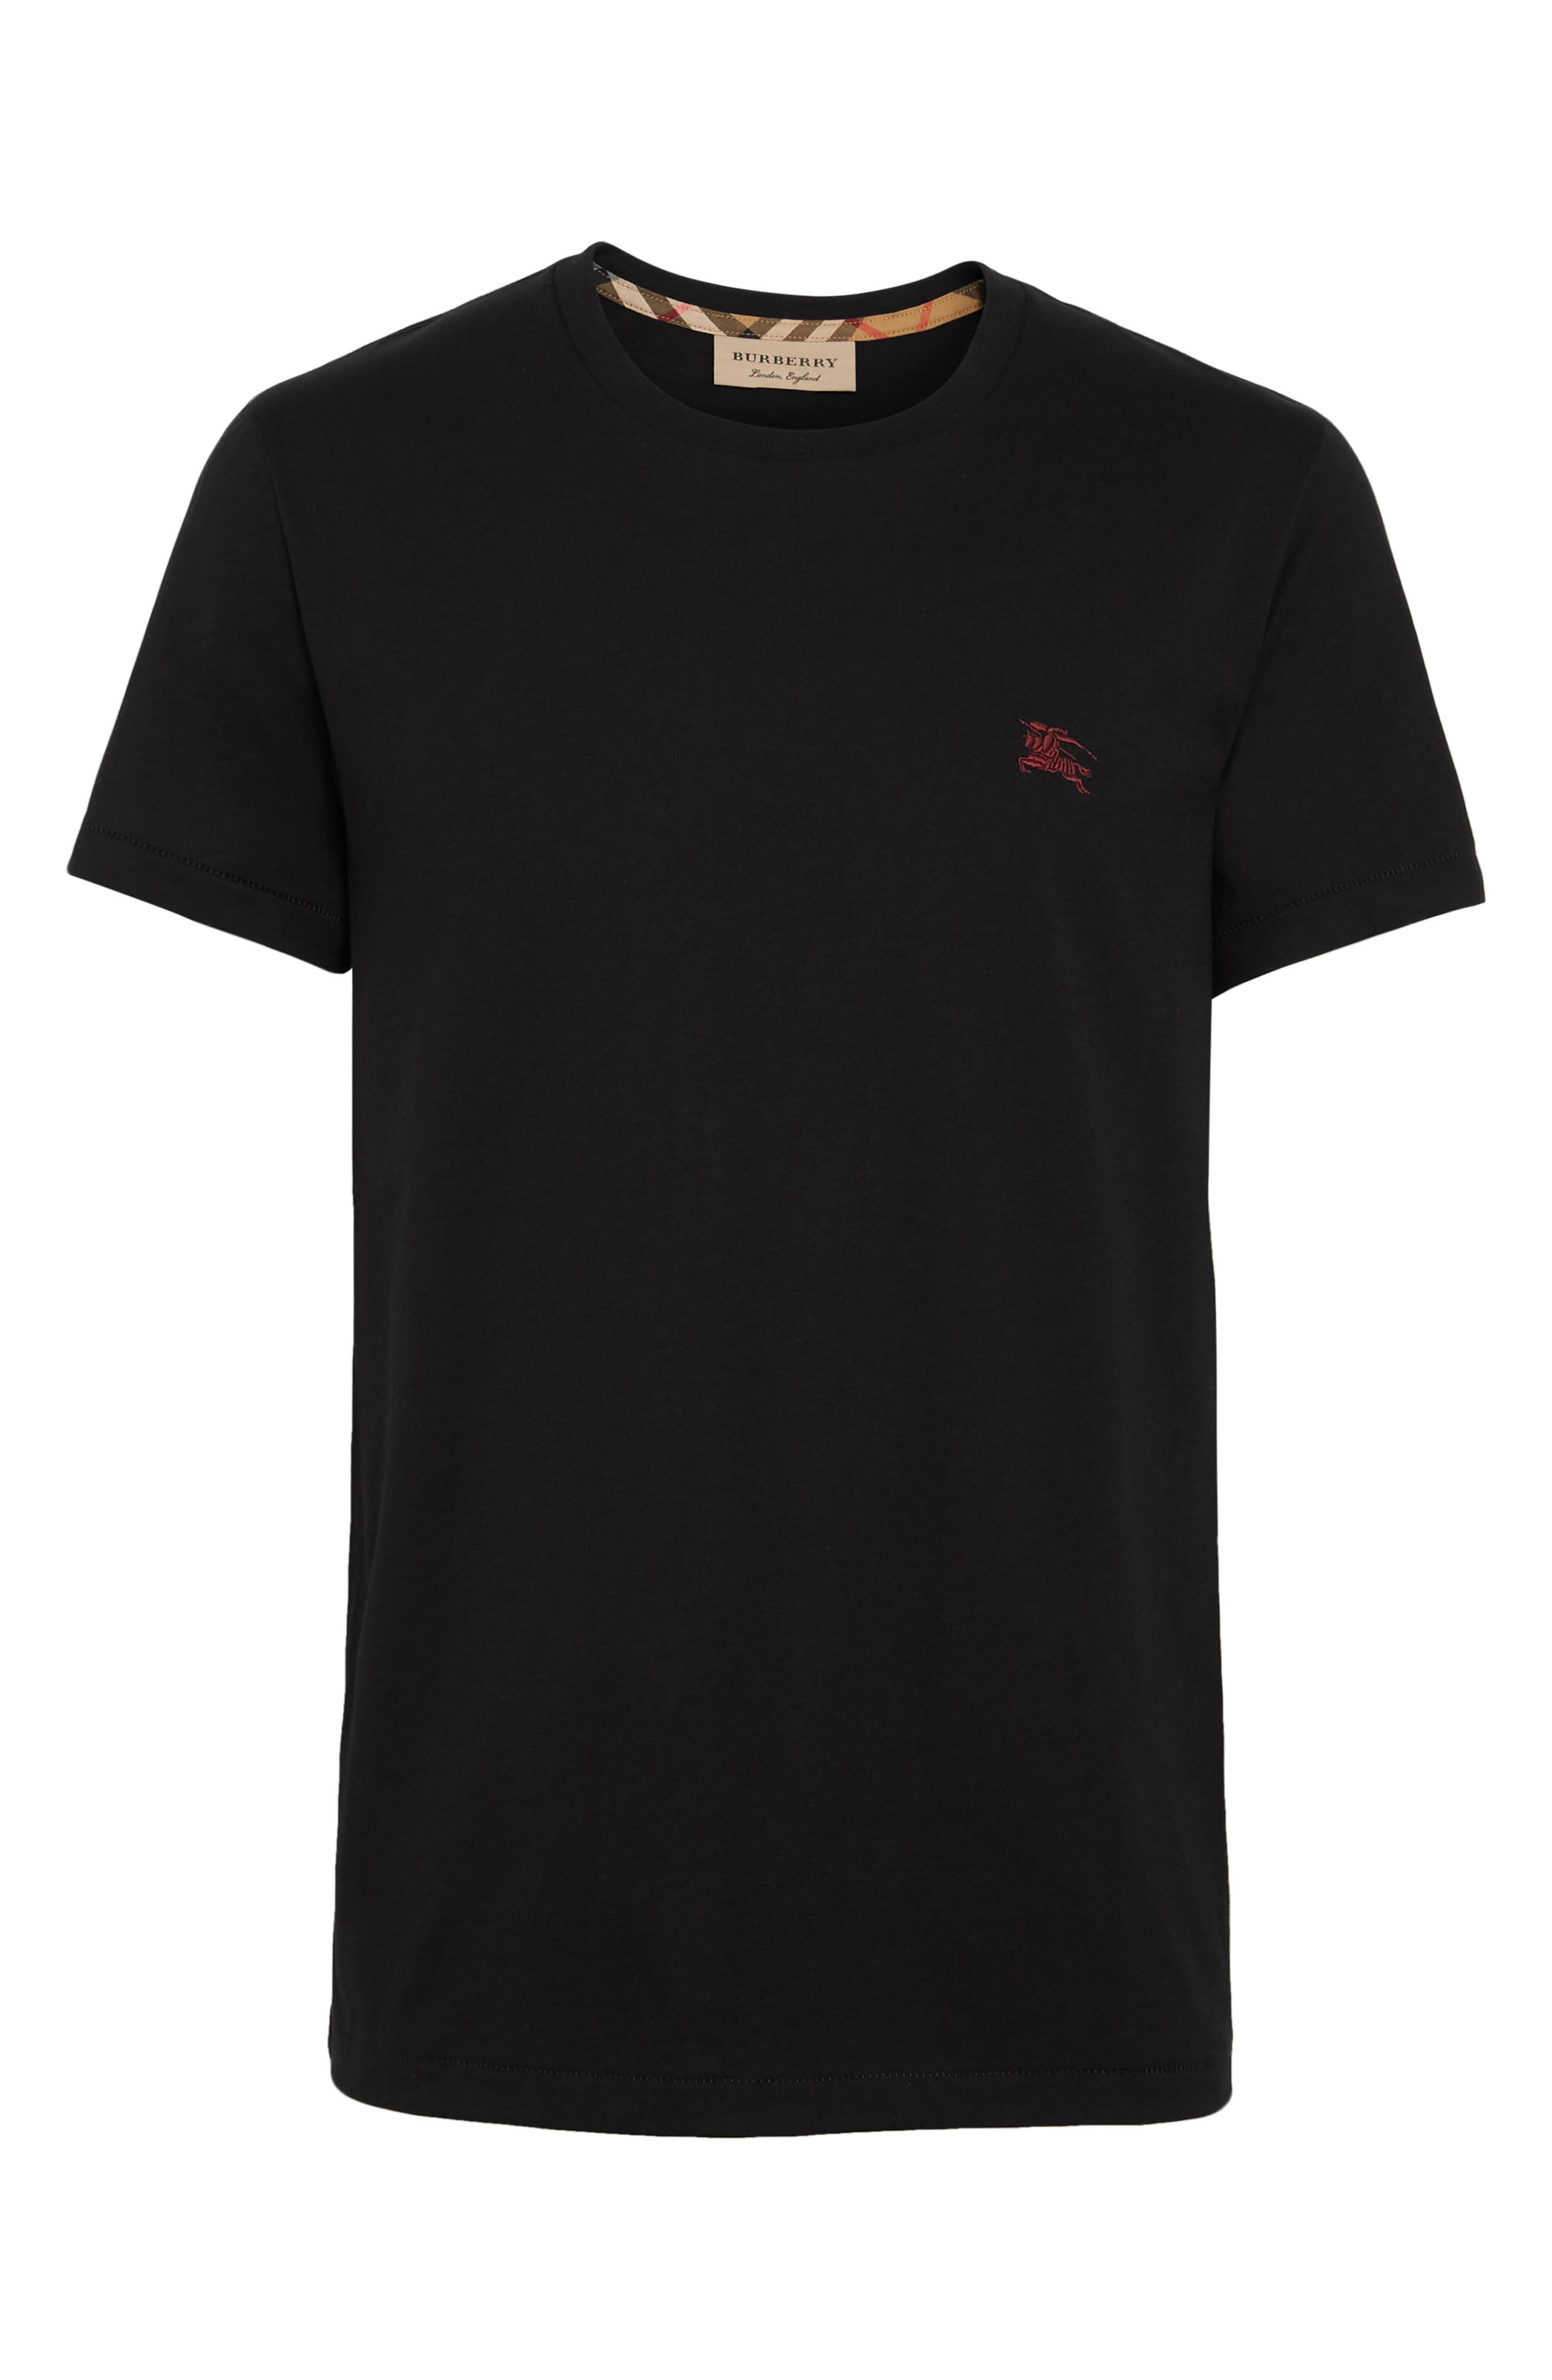 BURBERRY, Logo Embroidered Crewneck T-shirt, Alternate thumbnail 4, color, TRUE BLACK